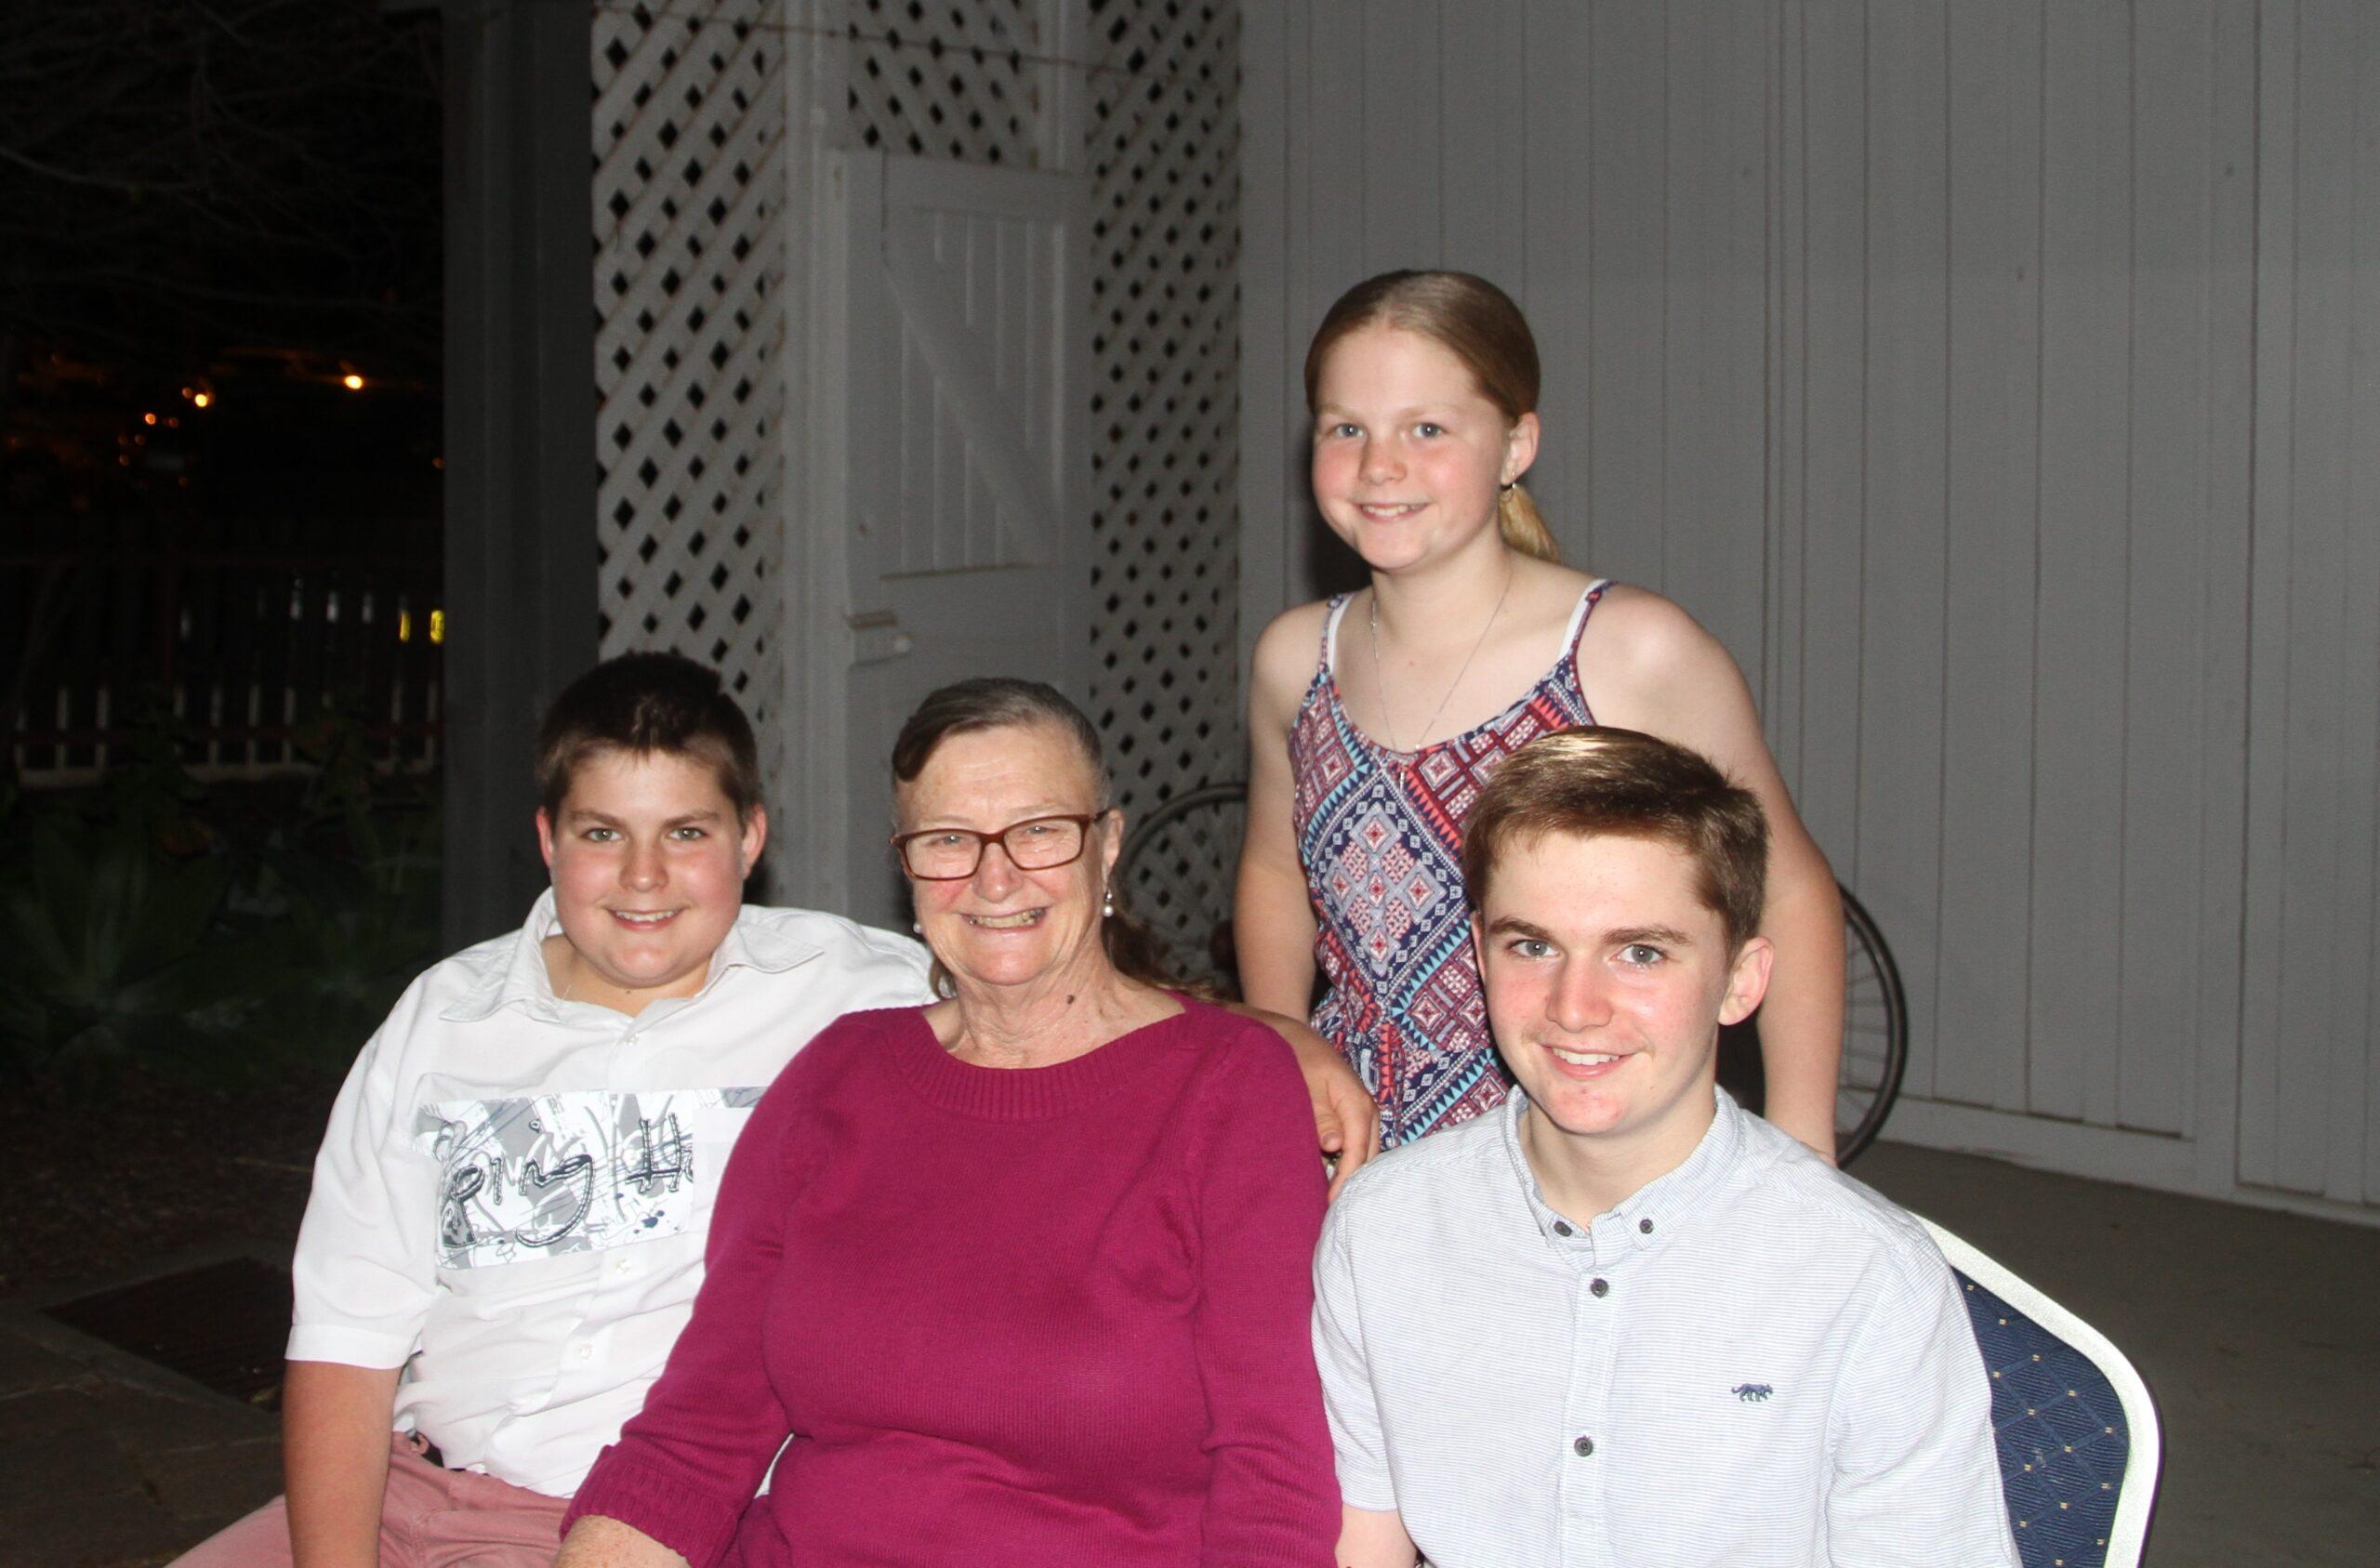 Exhibiting artist Helen Smith with her grandchildren Hunter, Daniel and Ava Smith.